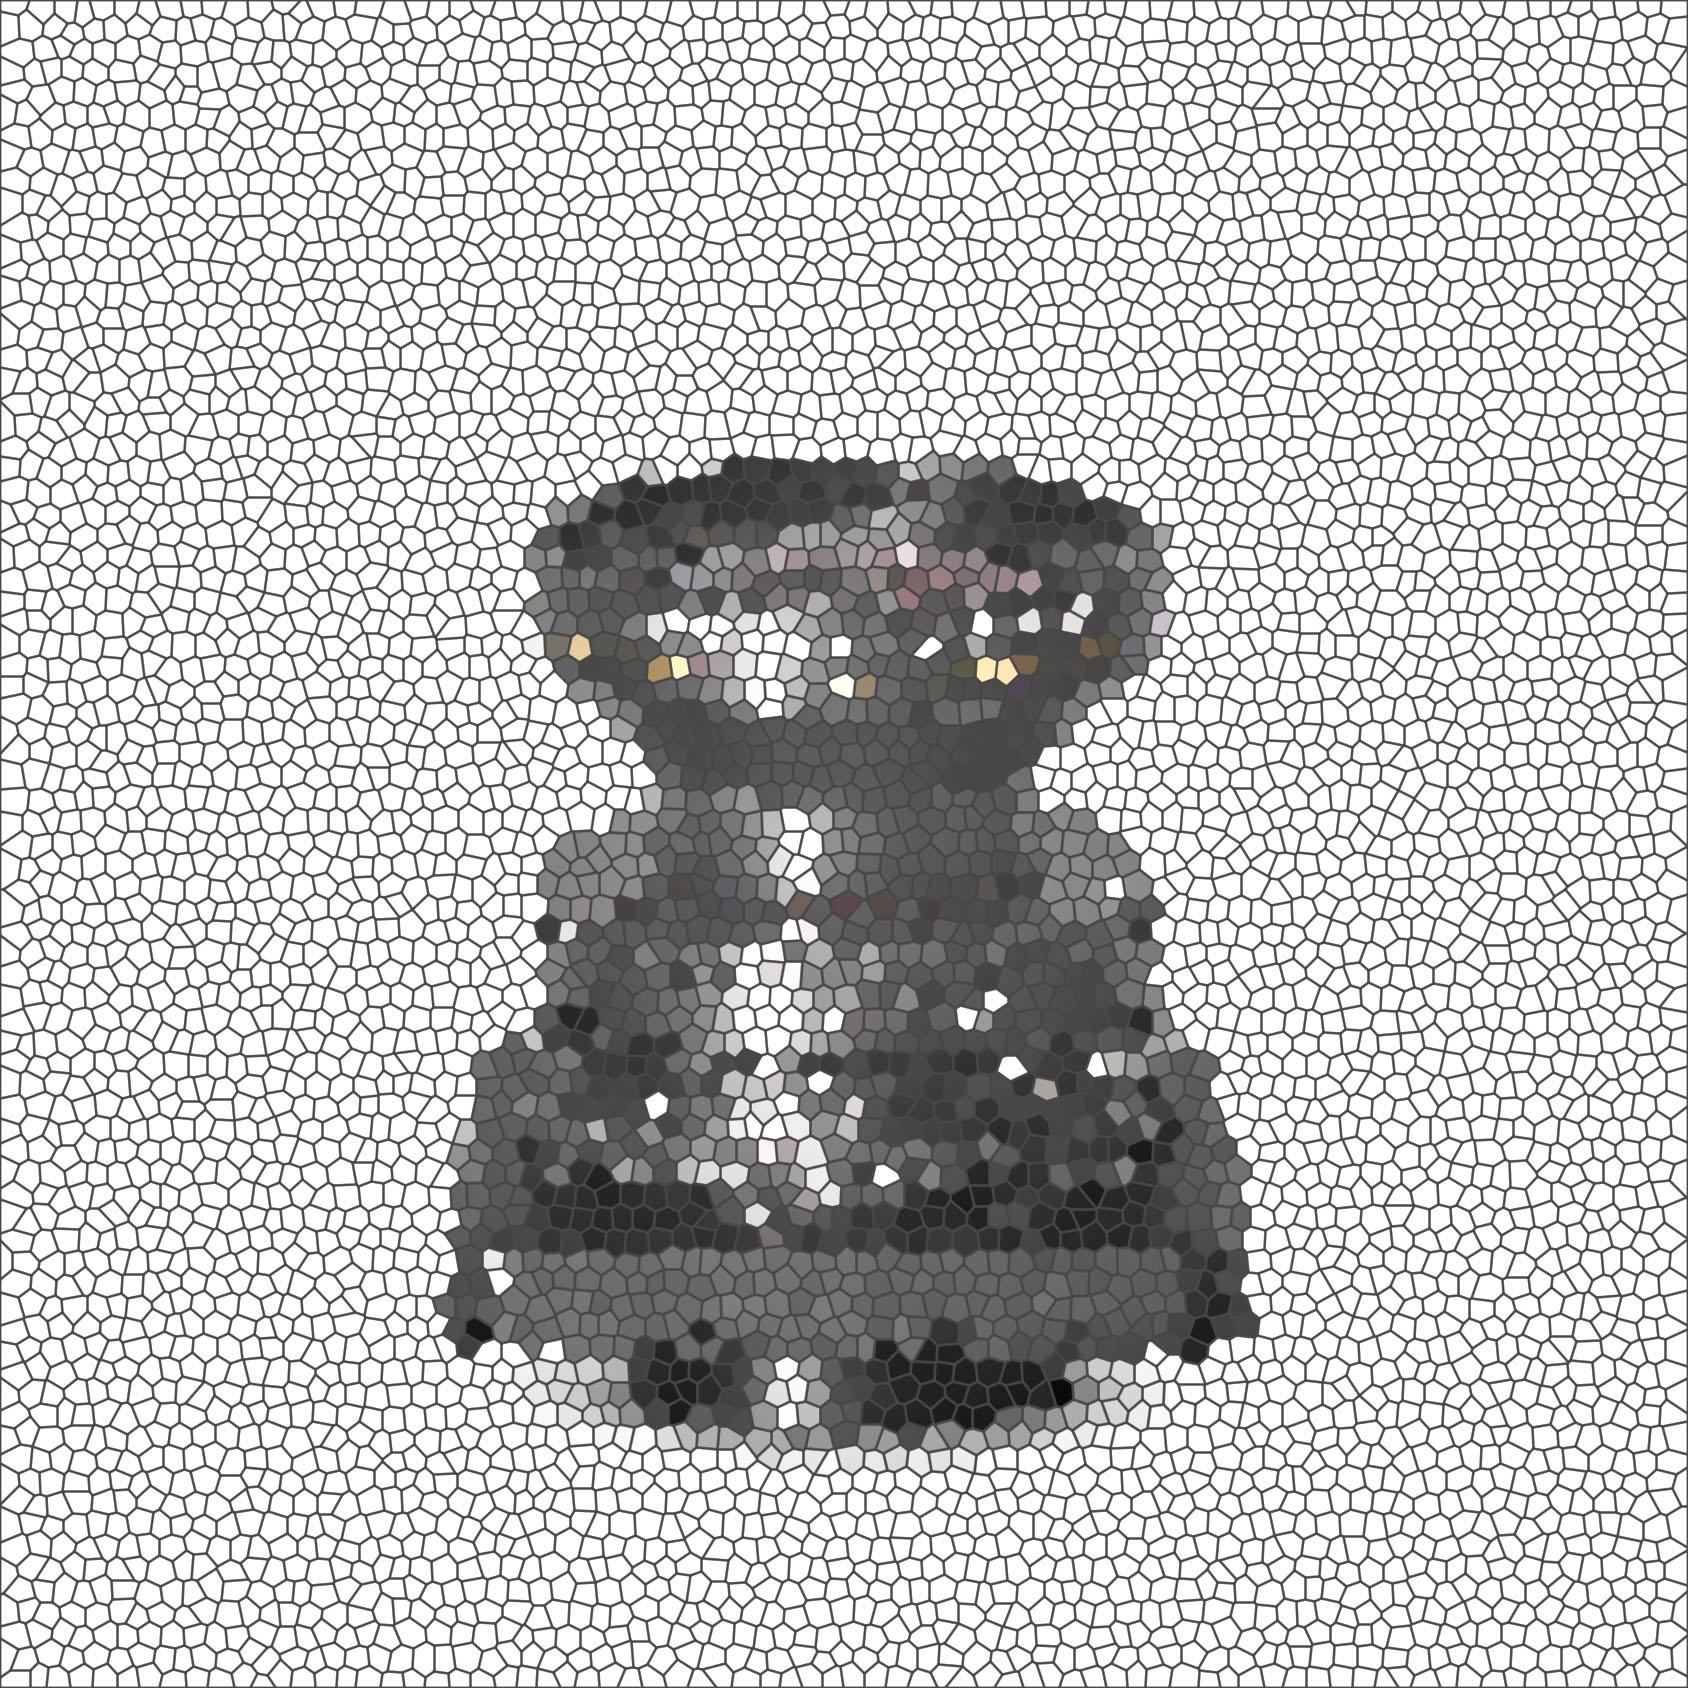 Rodenstock / ALPA HR Alpagon 4.0/40 mm, LB, in X-Shutter